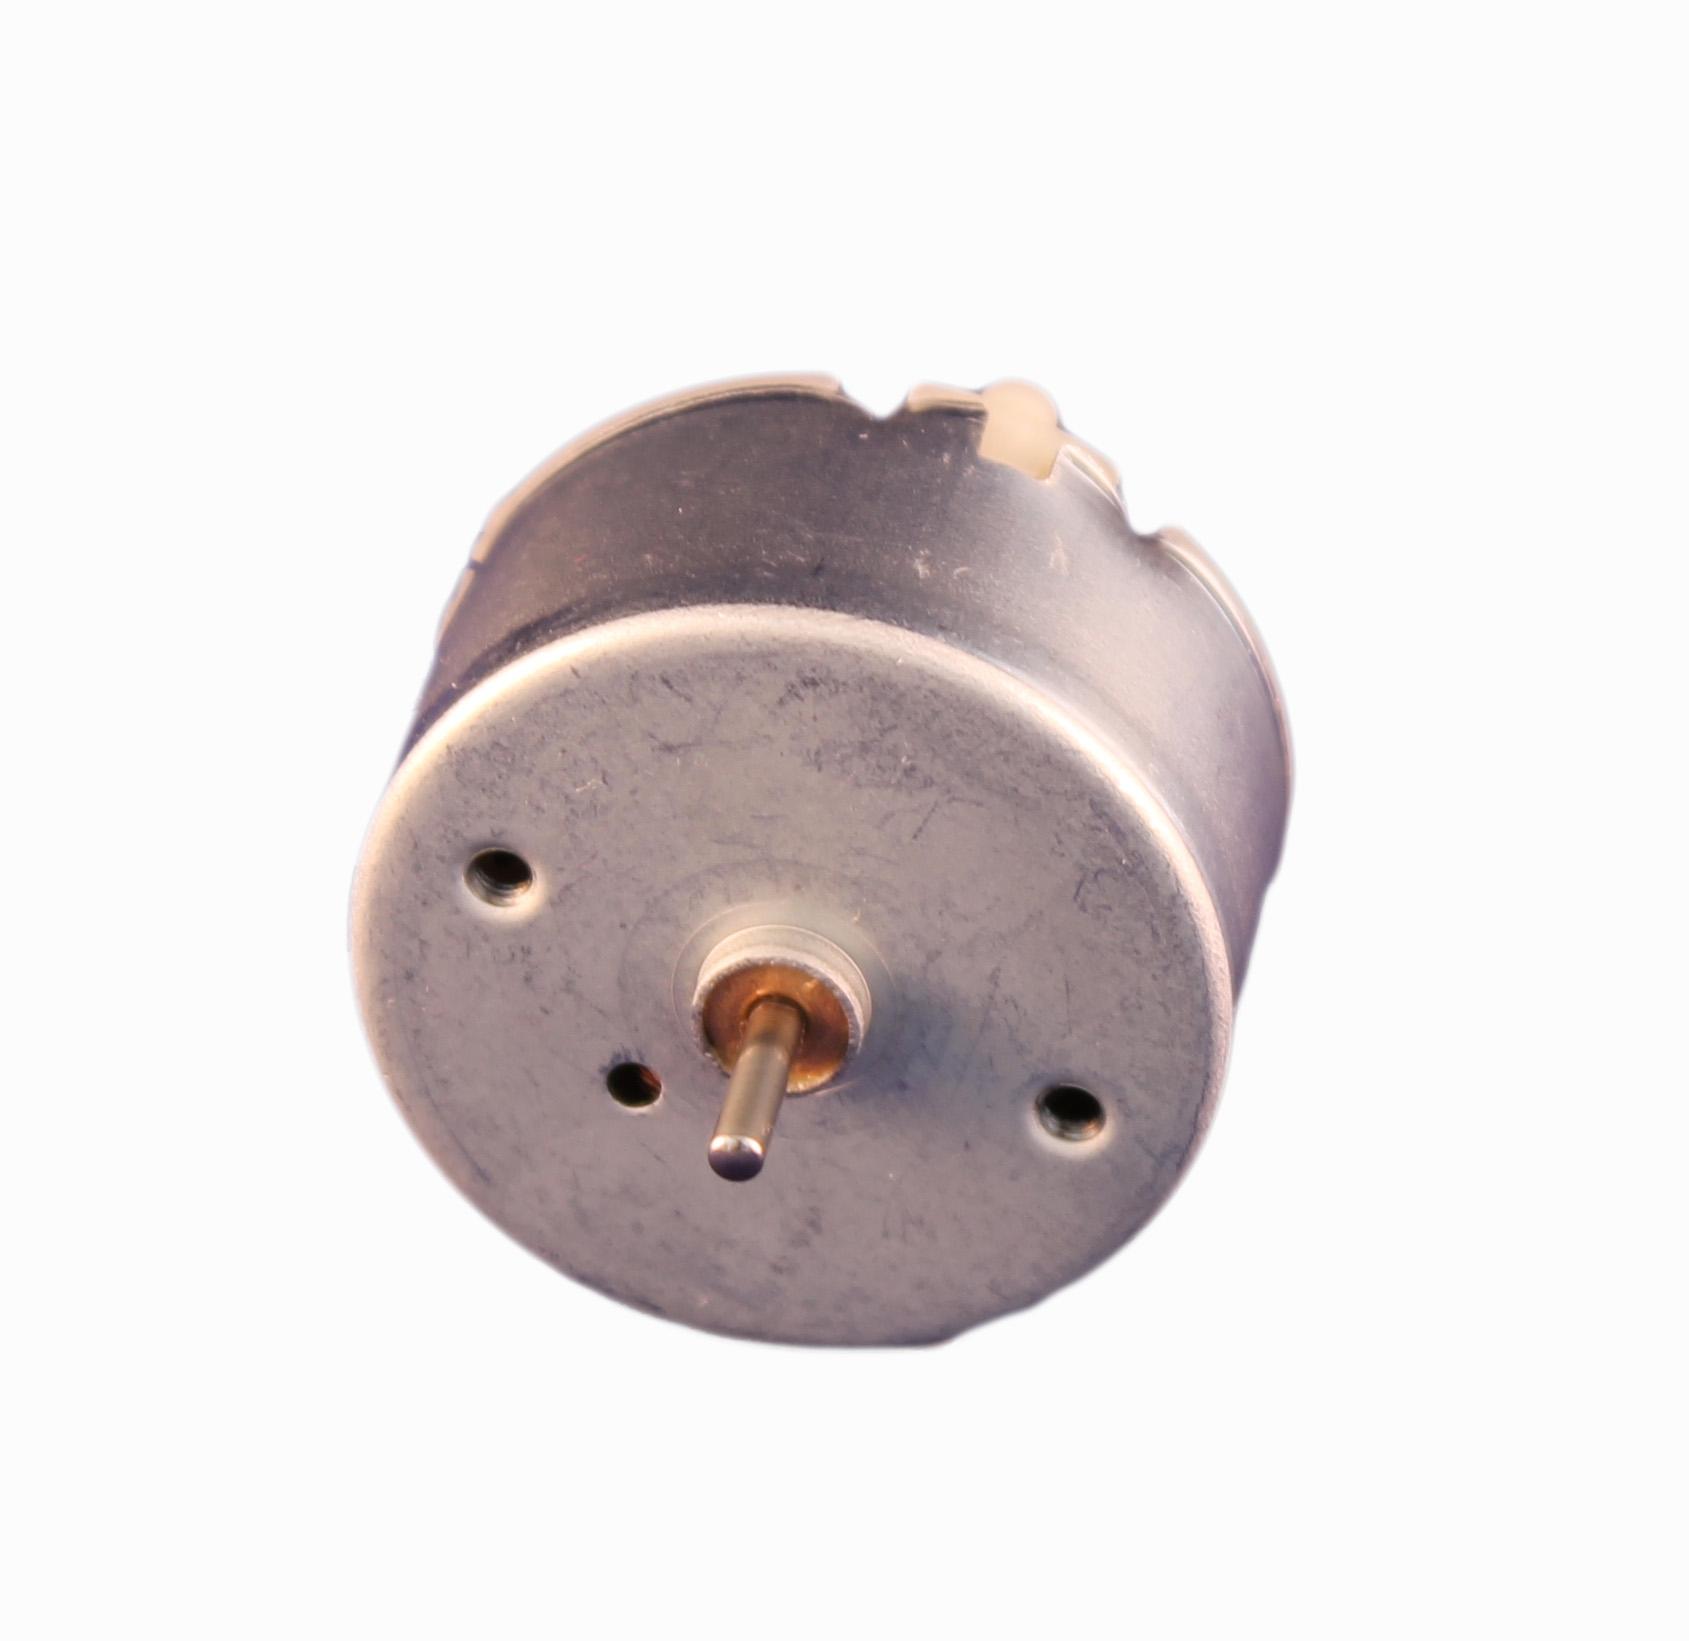 Motor Corriente DC, Voltaje 1.50V, R.P.M. 650rpm